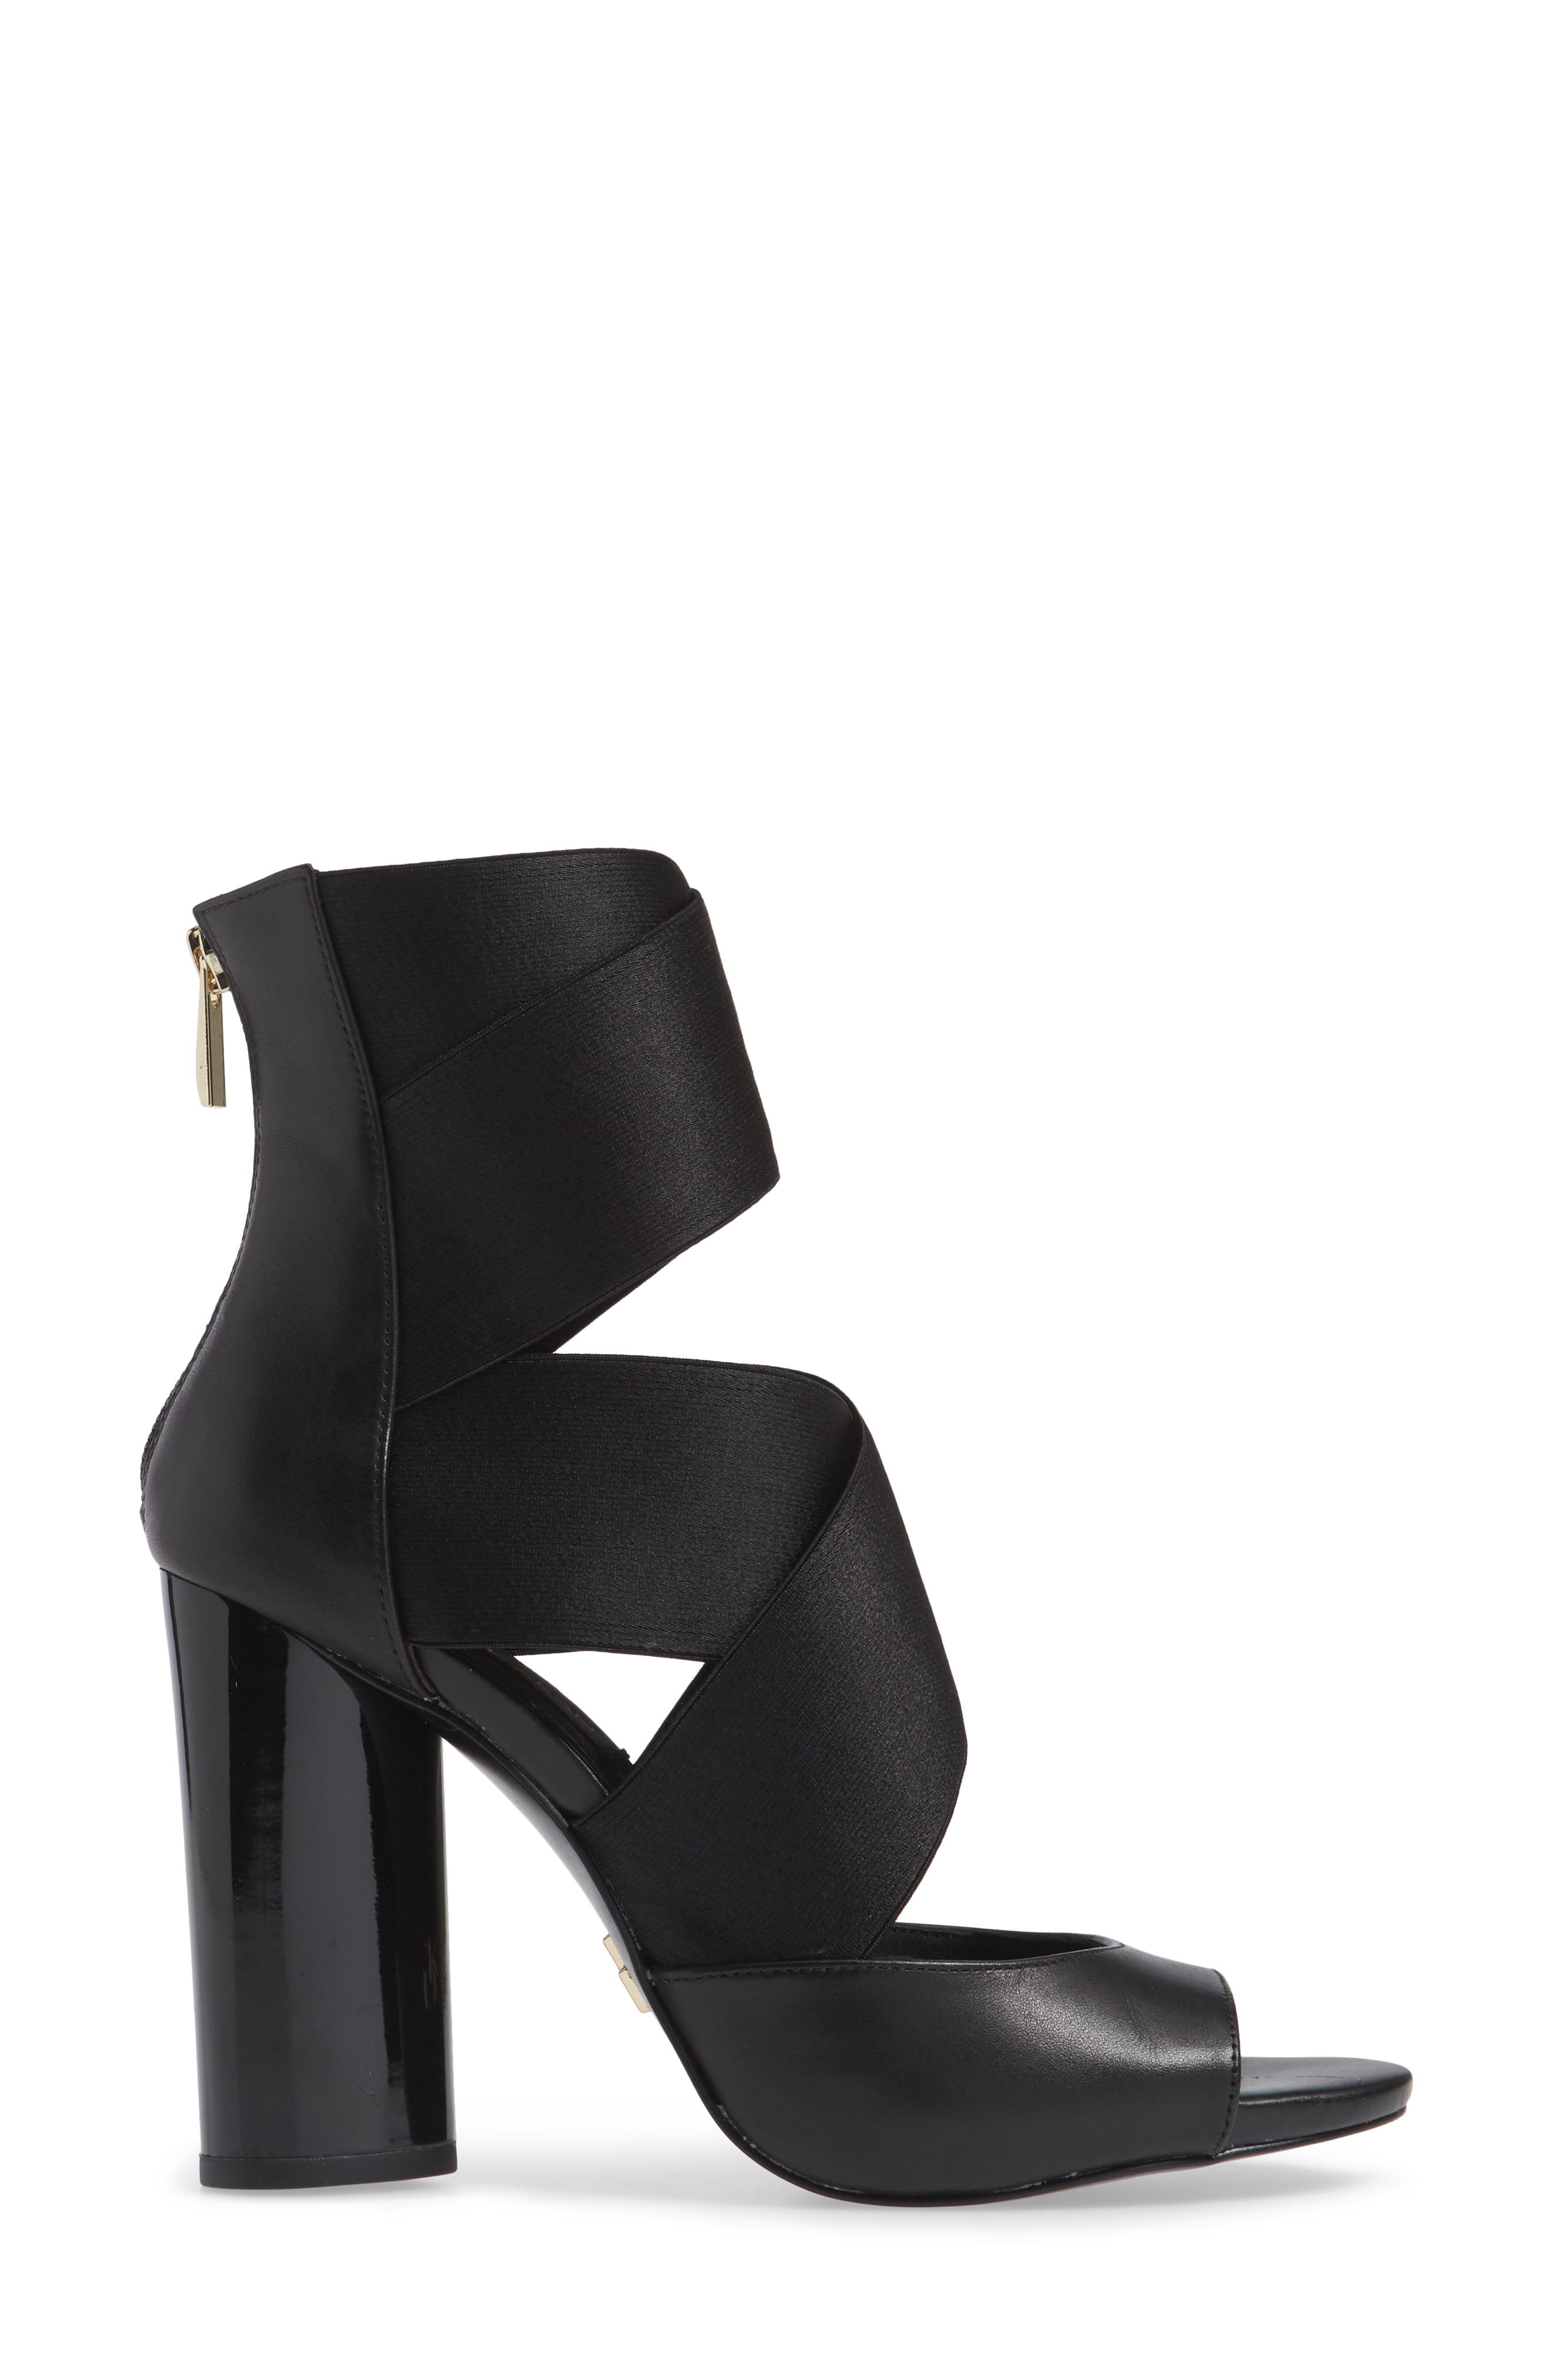 Donna Karan Briana Strappy High Sandal,                             Alternate thumbnail 3, color,                             BLACK CALF SHINY SATIN ELASTIC